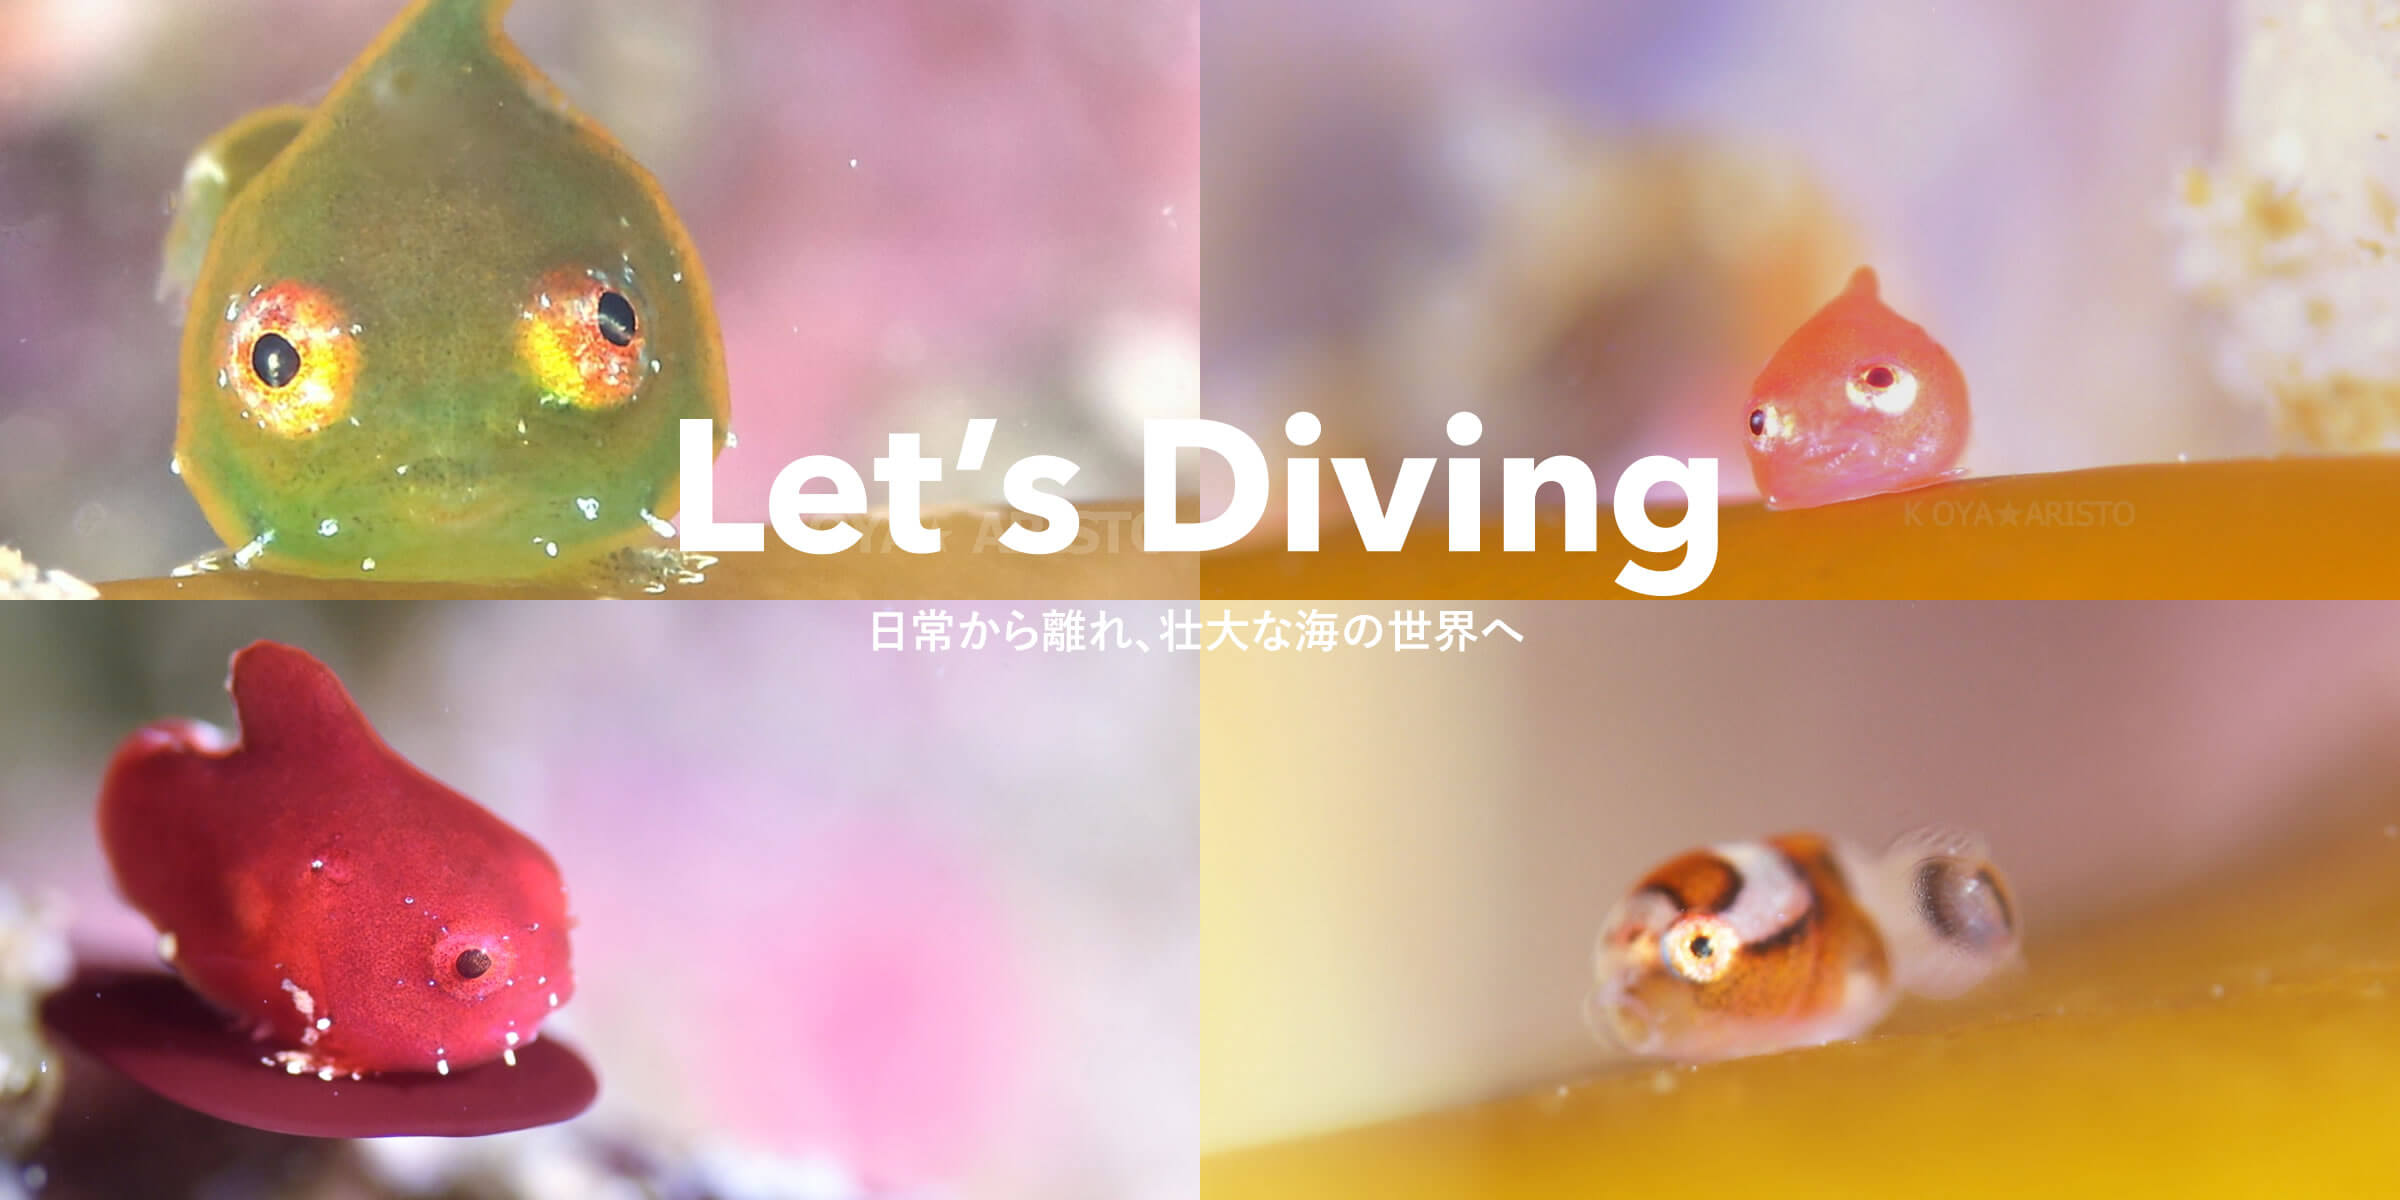 Let's Diving